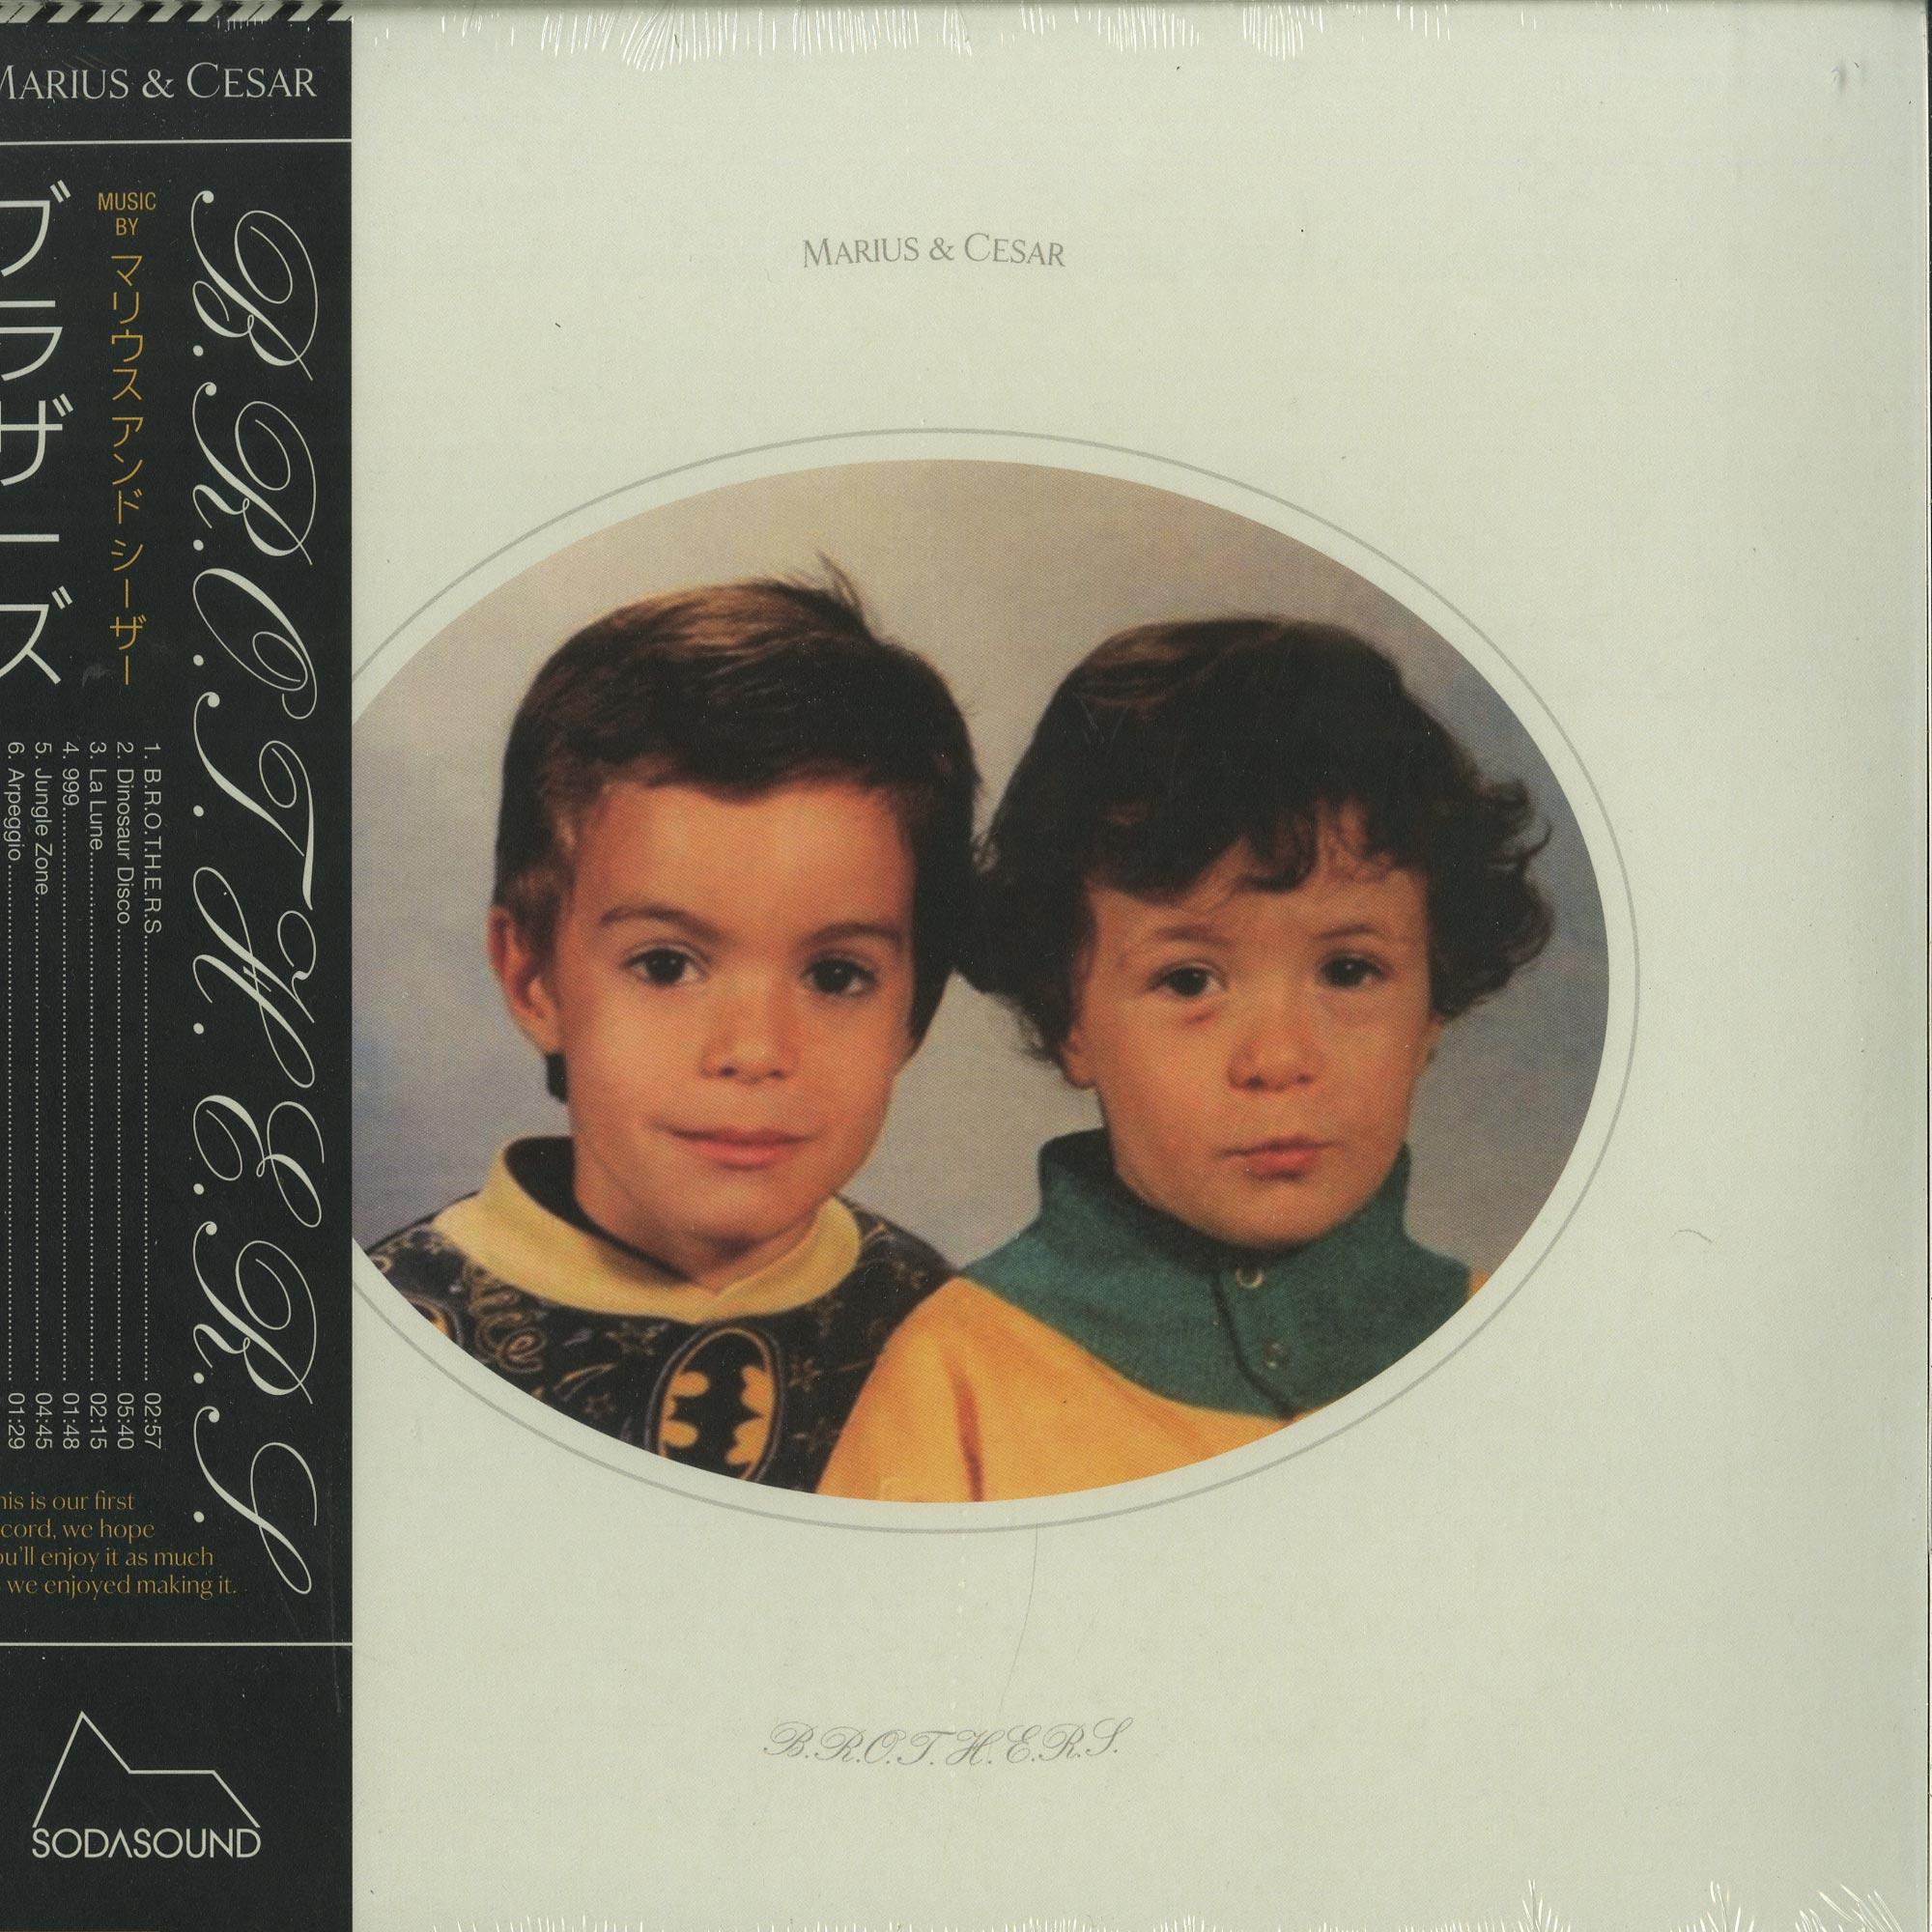 Marius & Cesar - B.R.O.T.H.E.R.S.